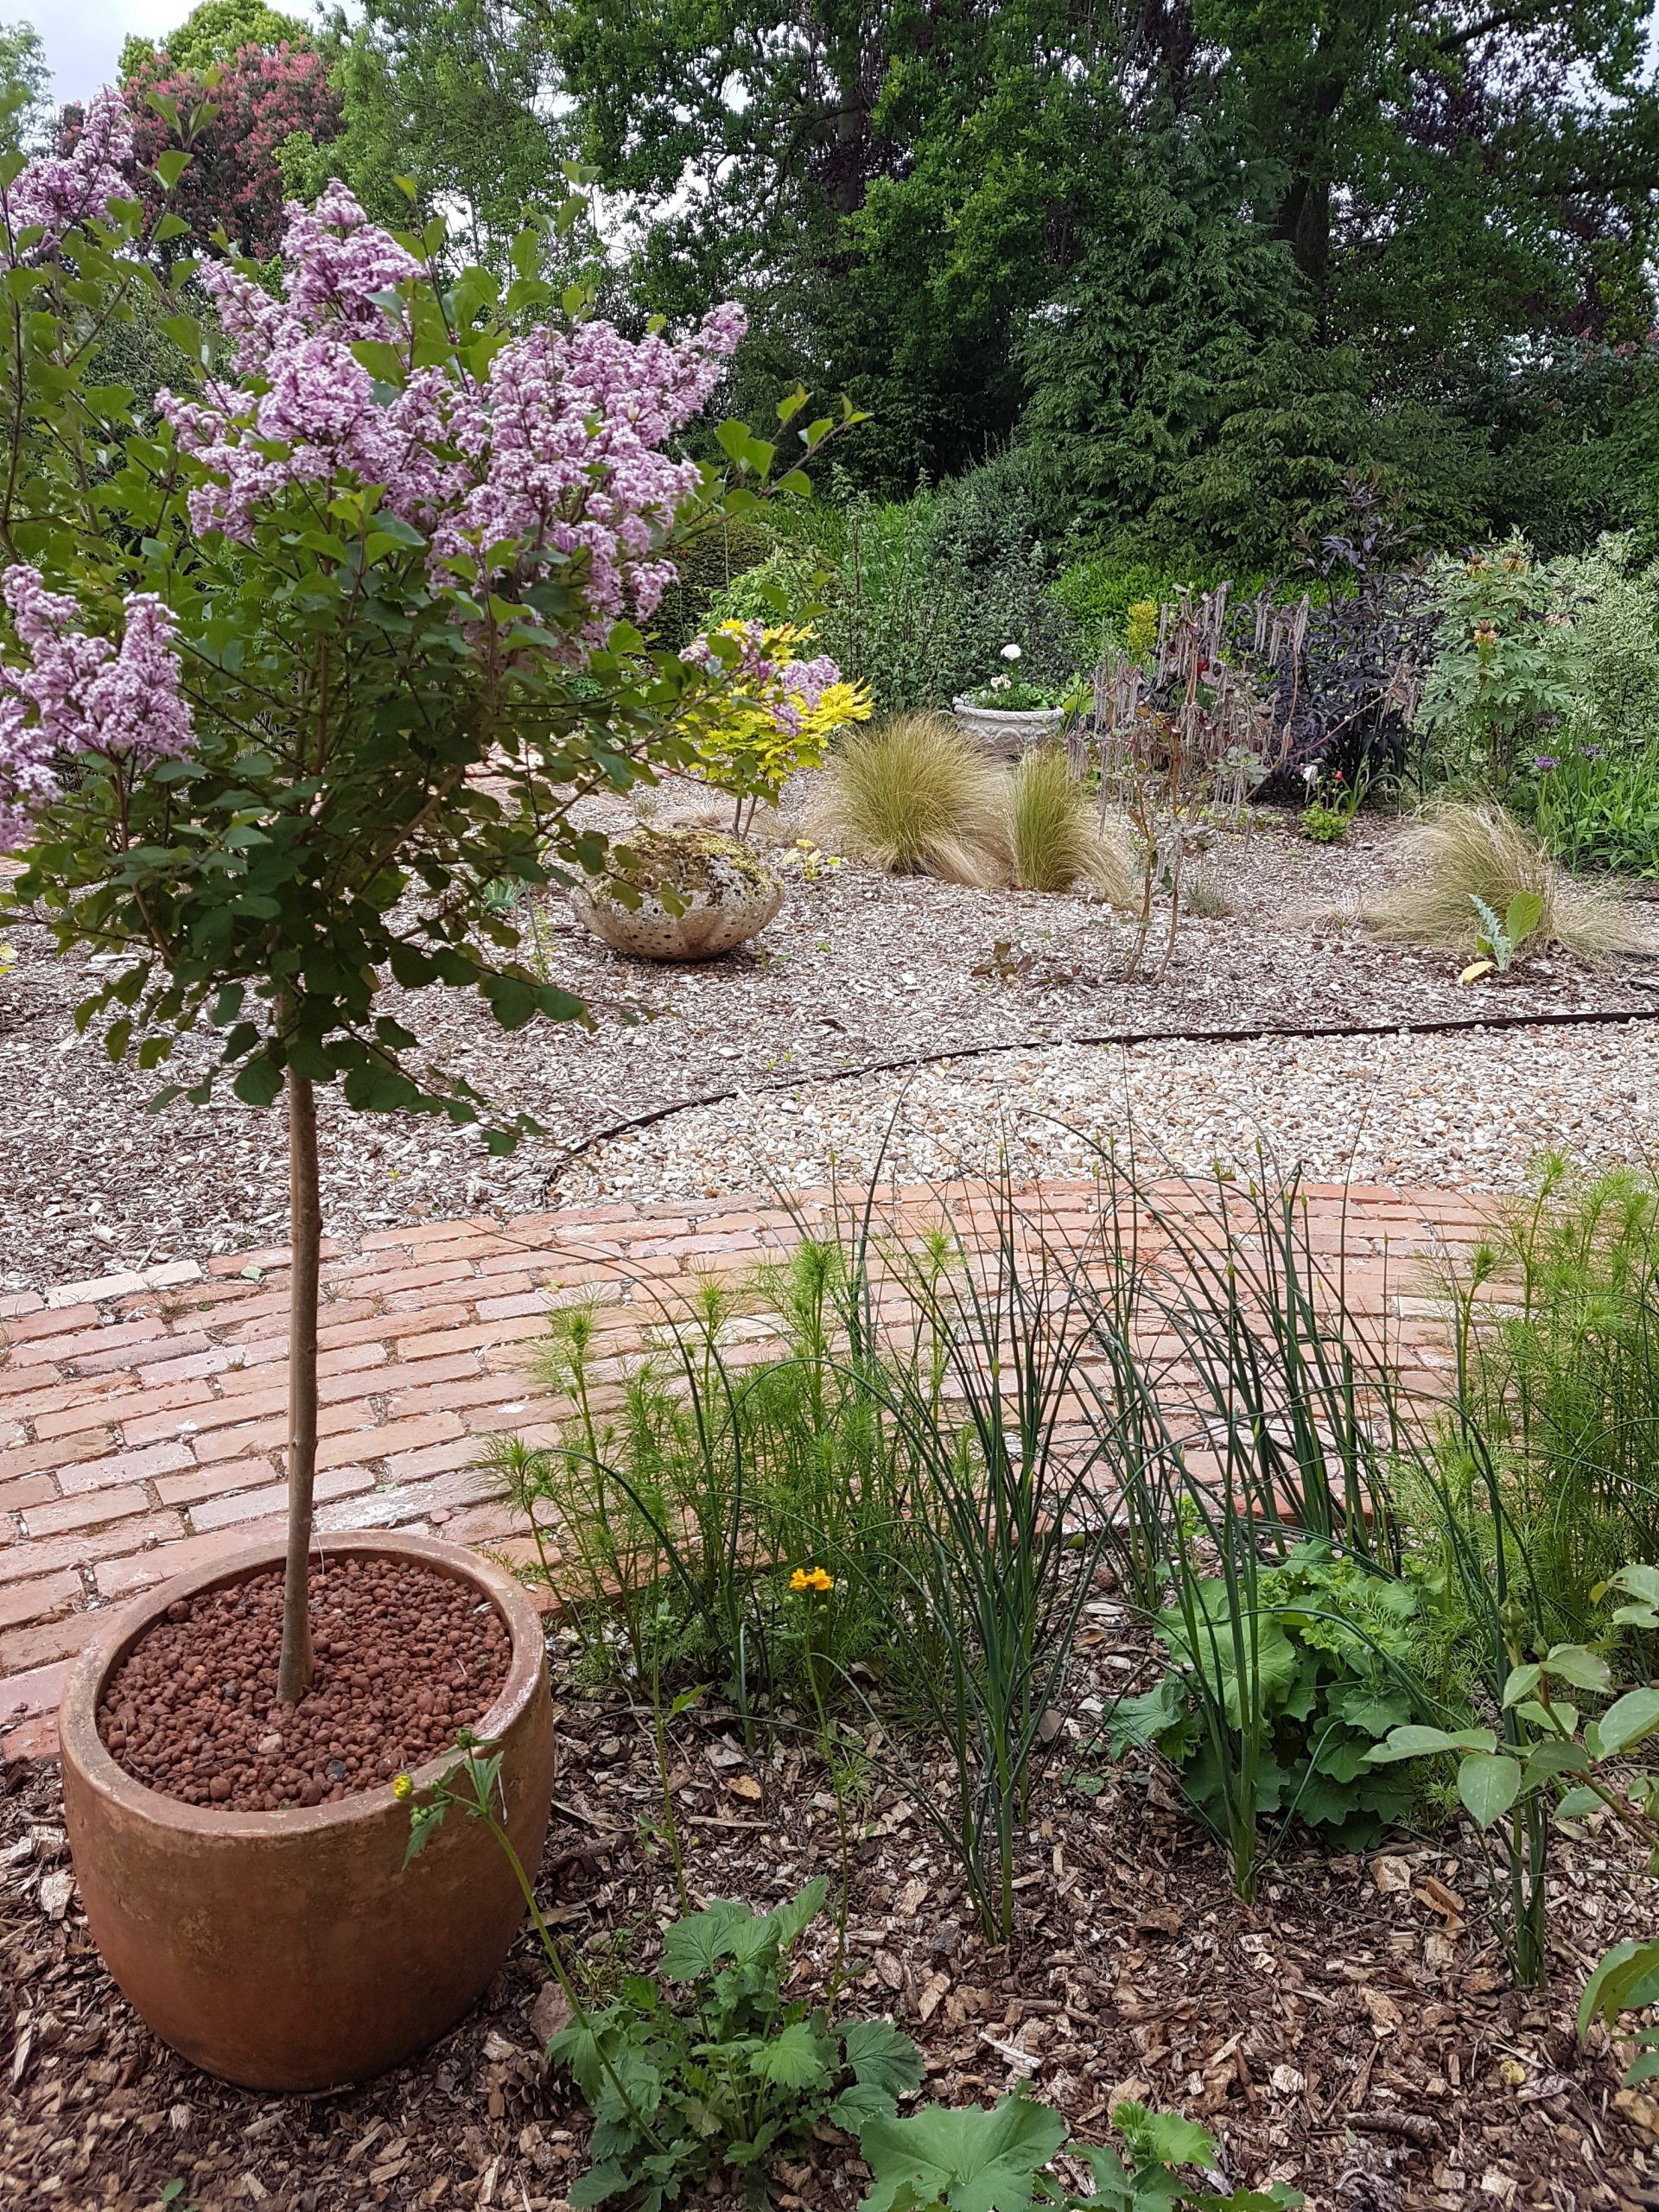 The Old Rectory – Open Garden